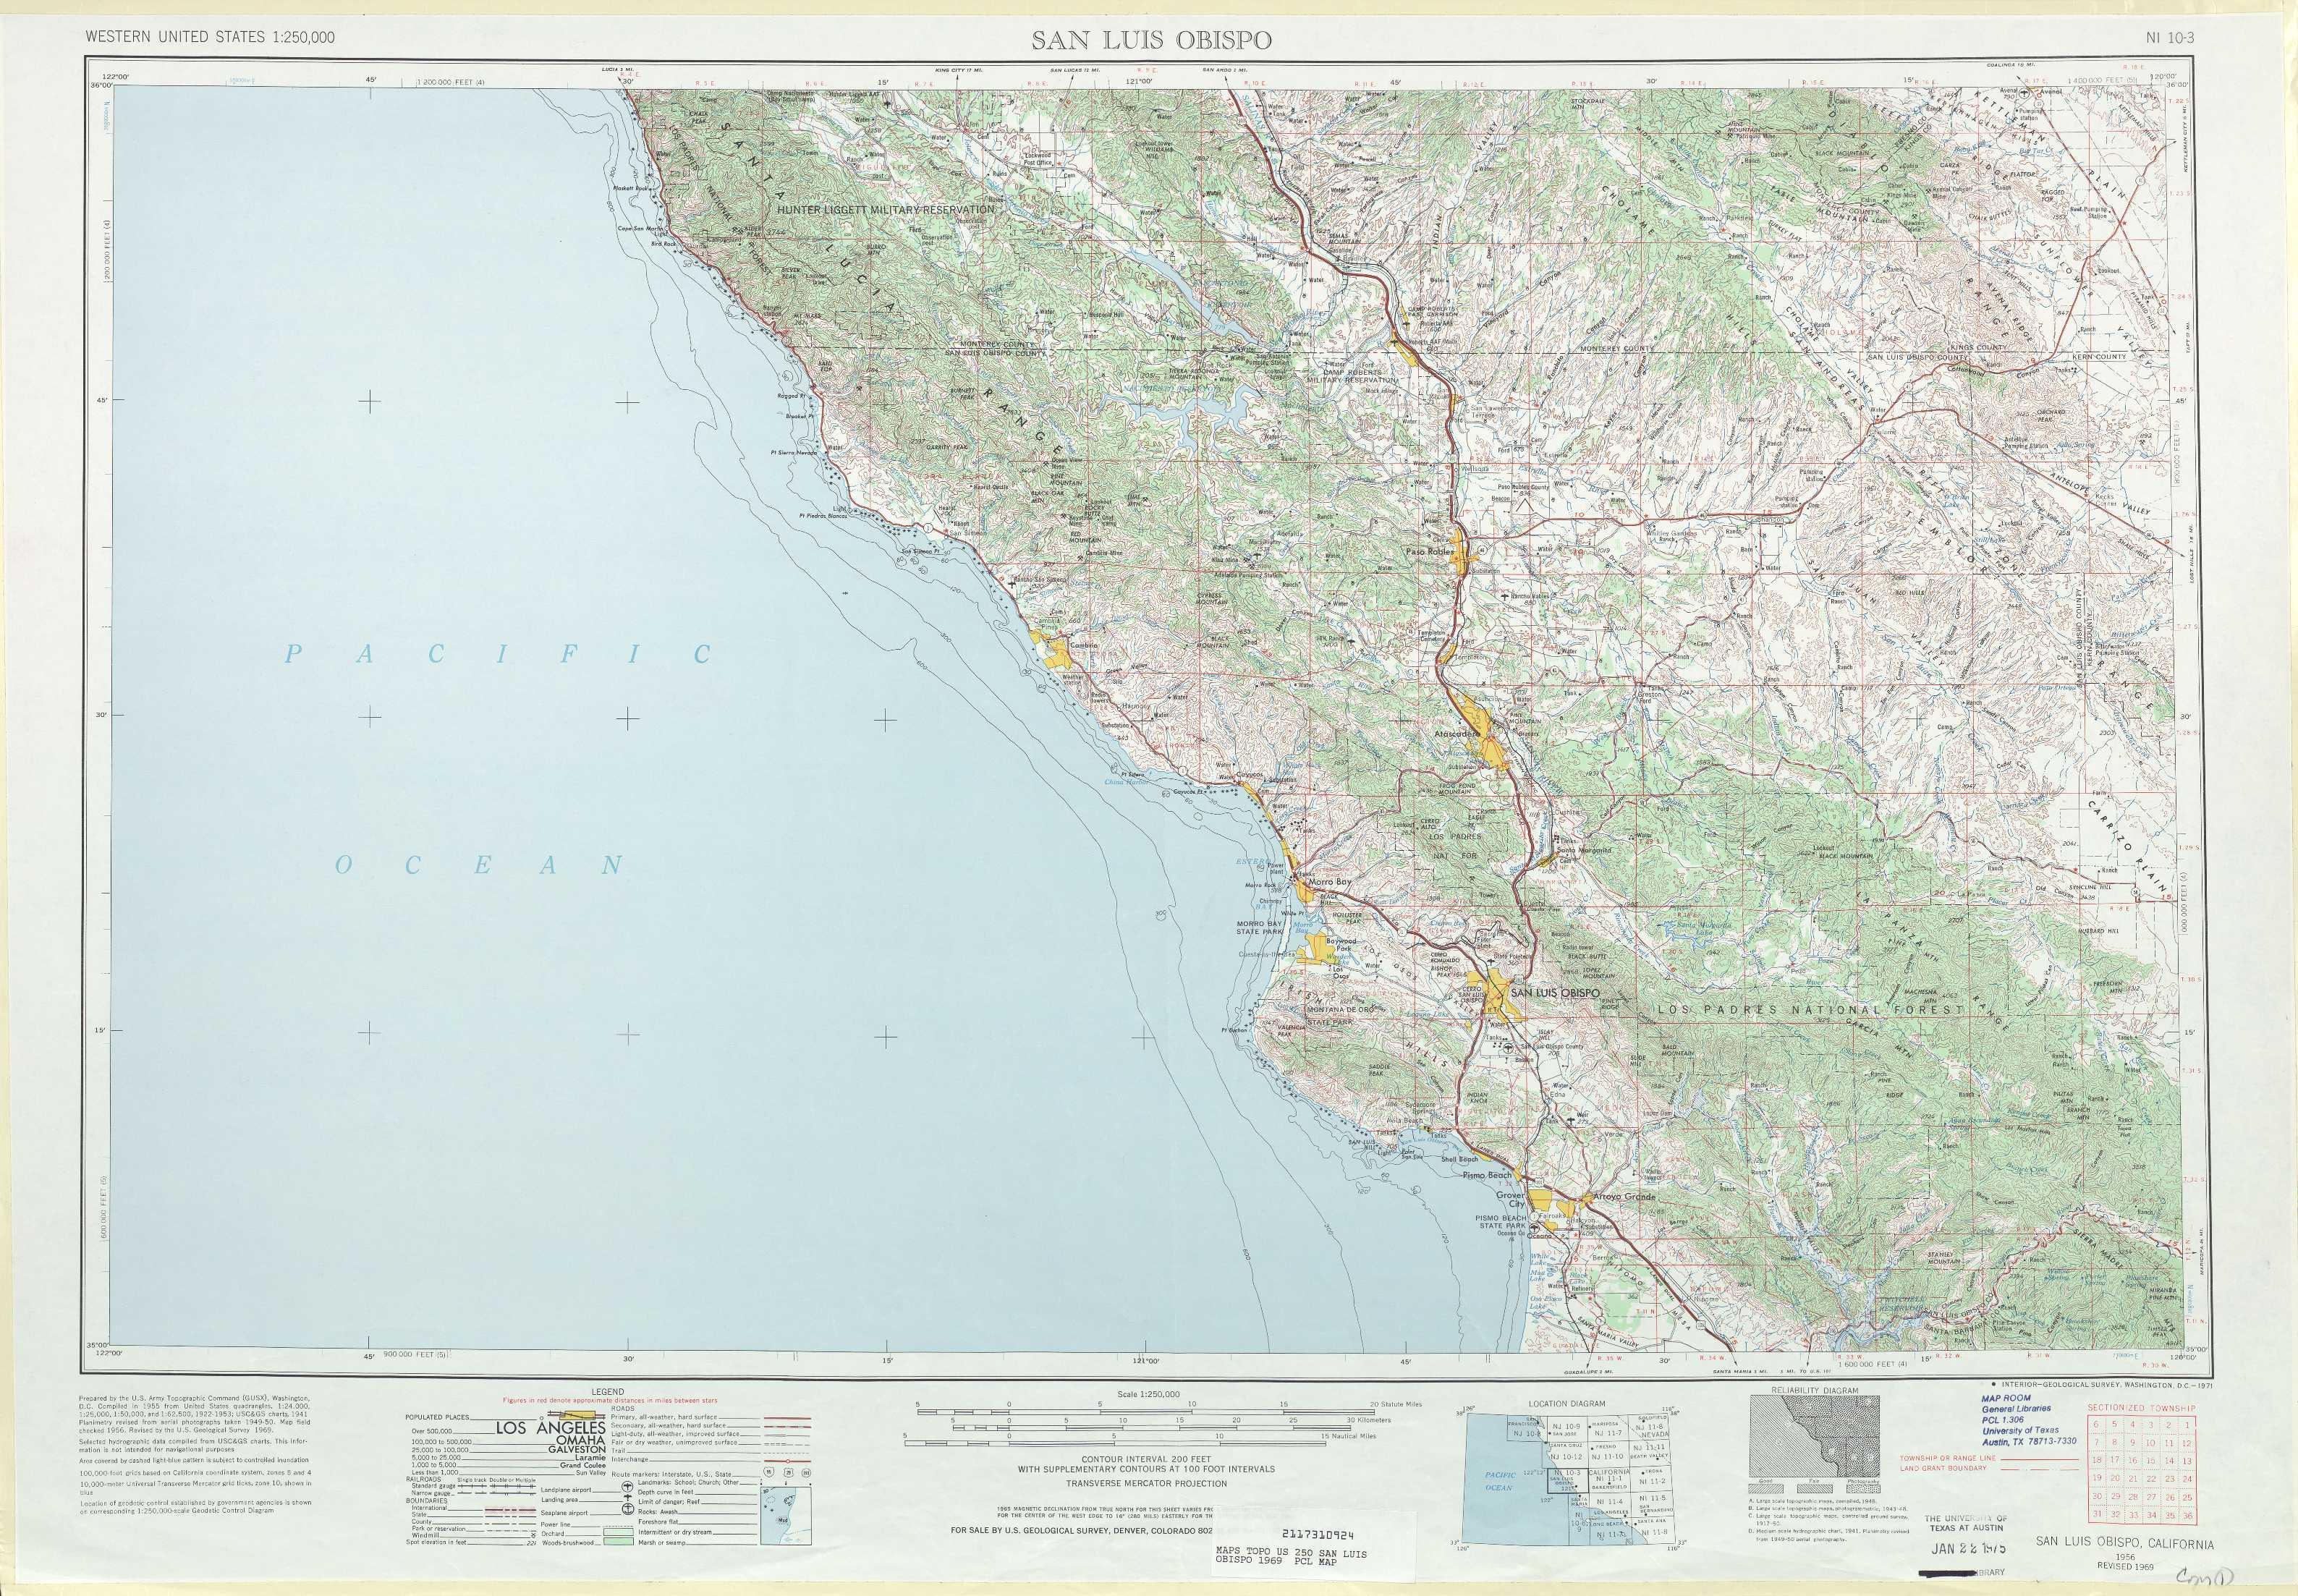 San Luis Obispo Topographic Maps, Ca - Usgs Topo Quad 35120A1 At 1 - Usgs Maps California